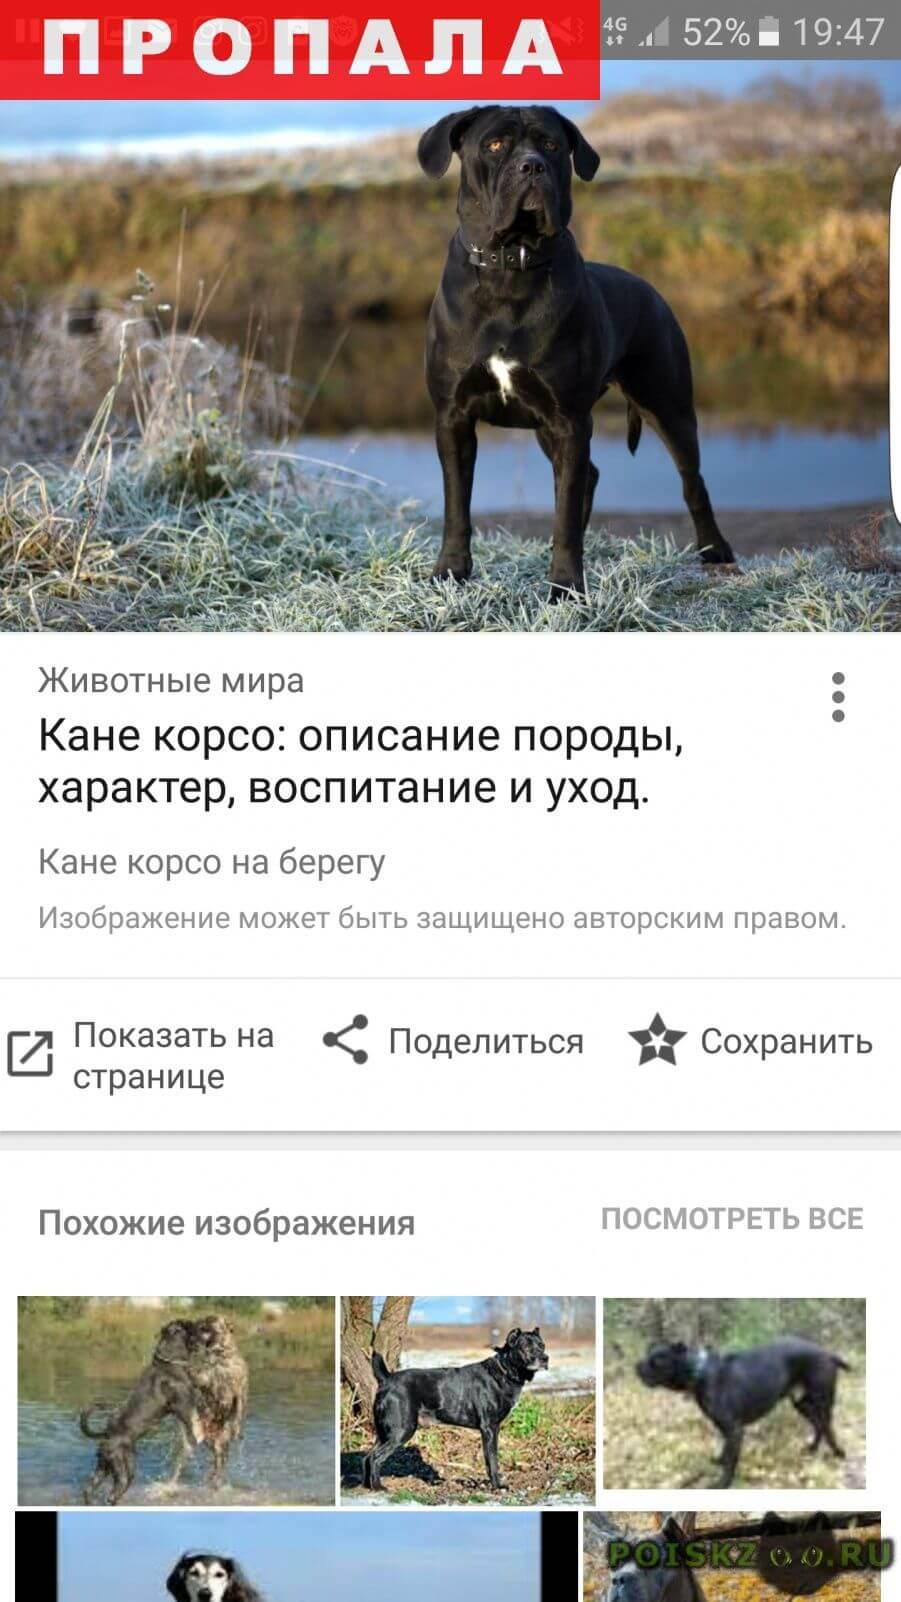 Пропала собака помогите пожалуйста найти собаку  г.Санкт-Петербург